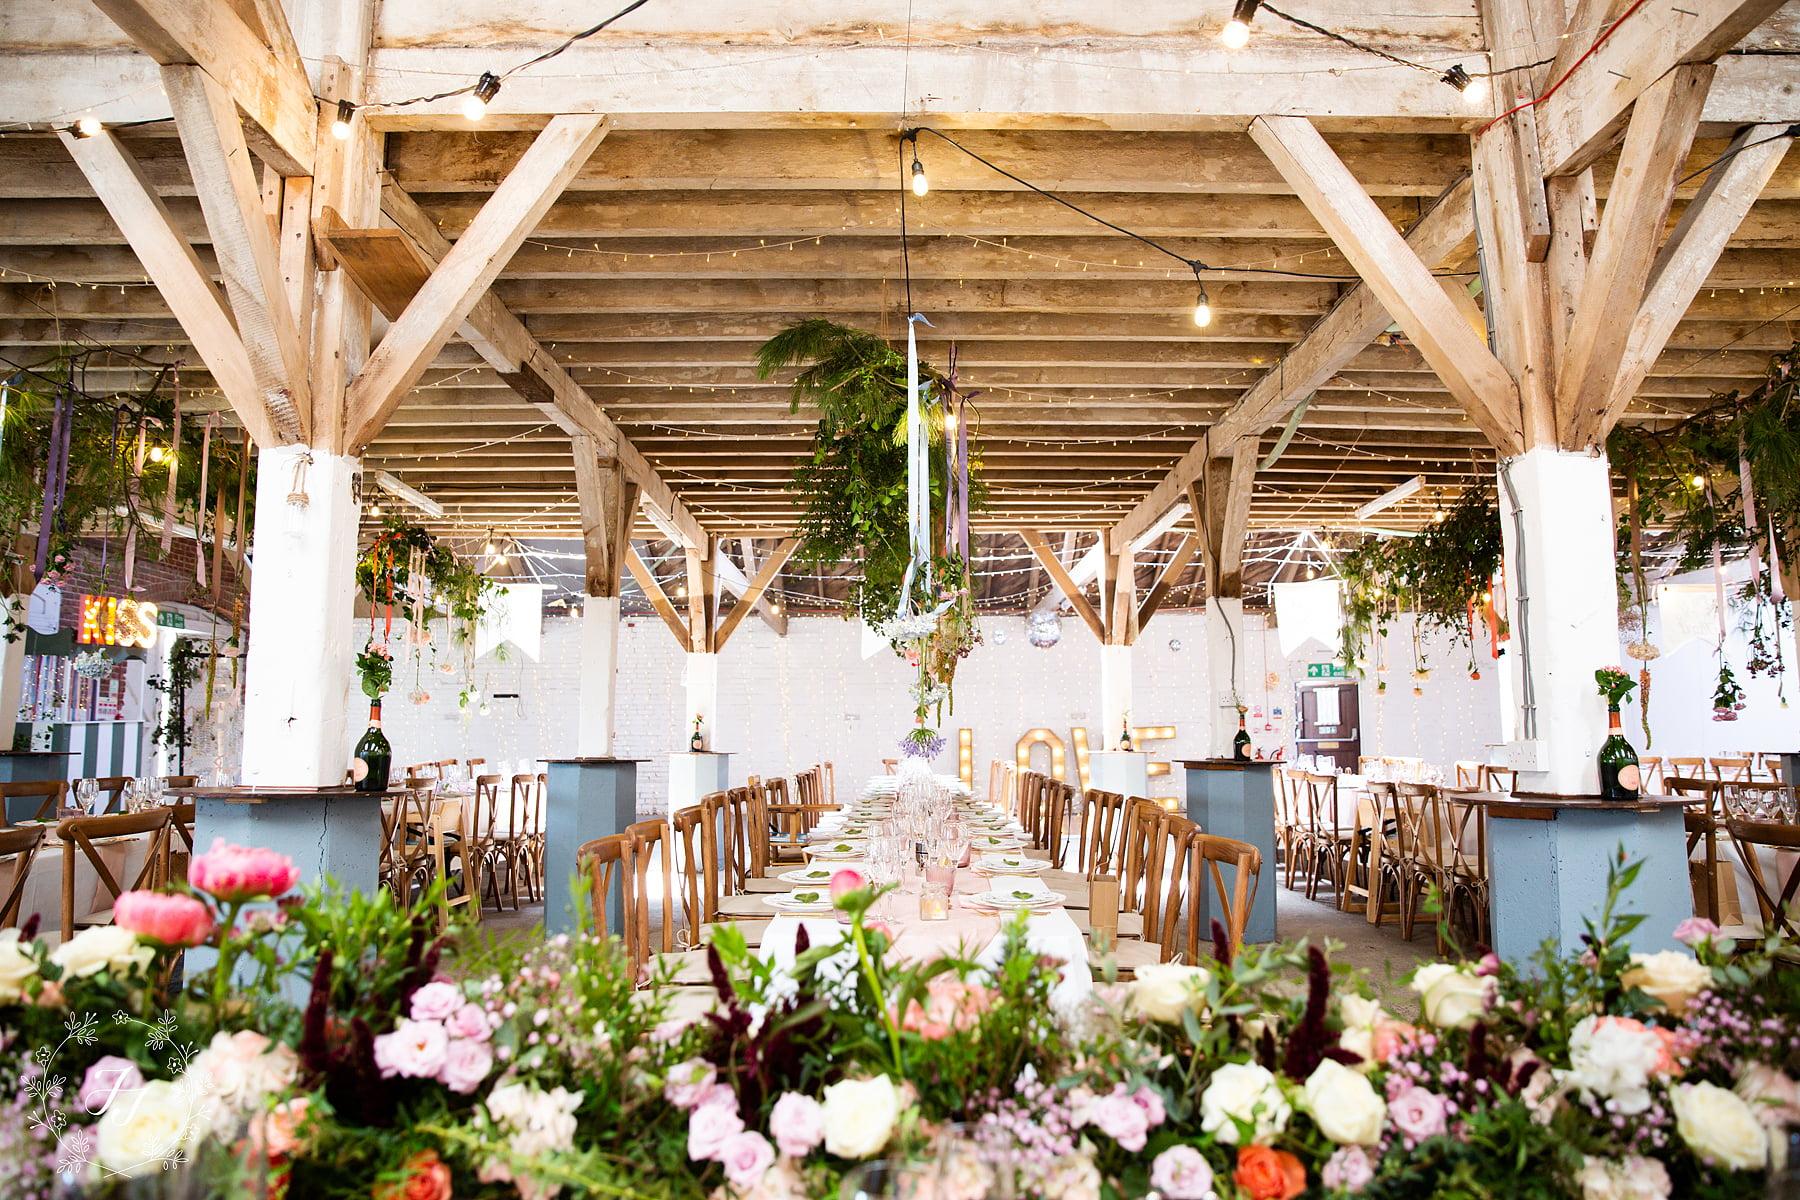 wedding photography at the railway barn, inside setup for a wedding